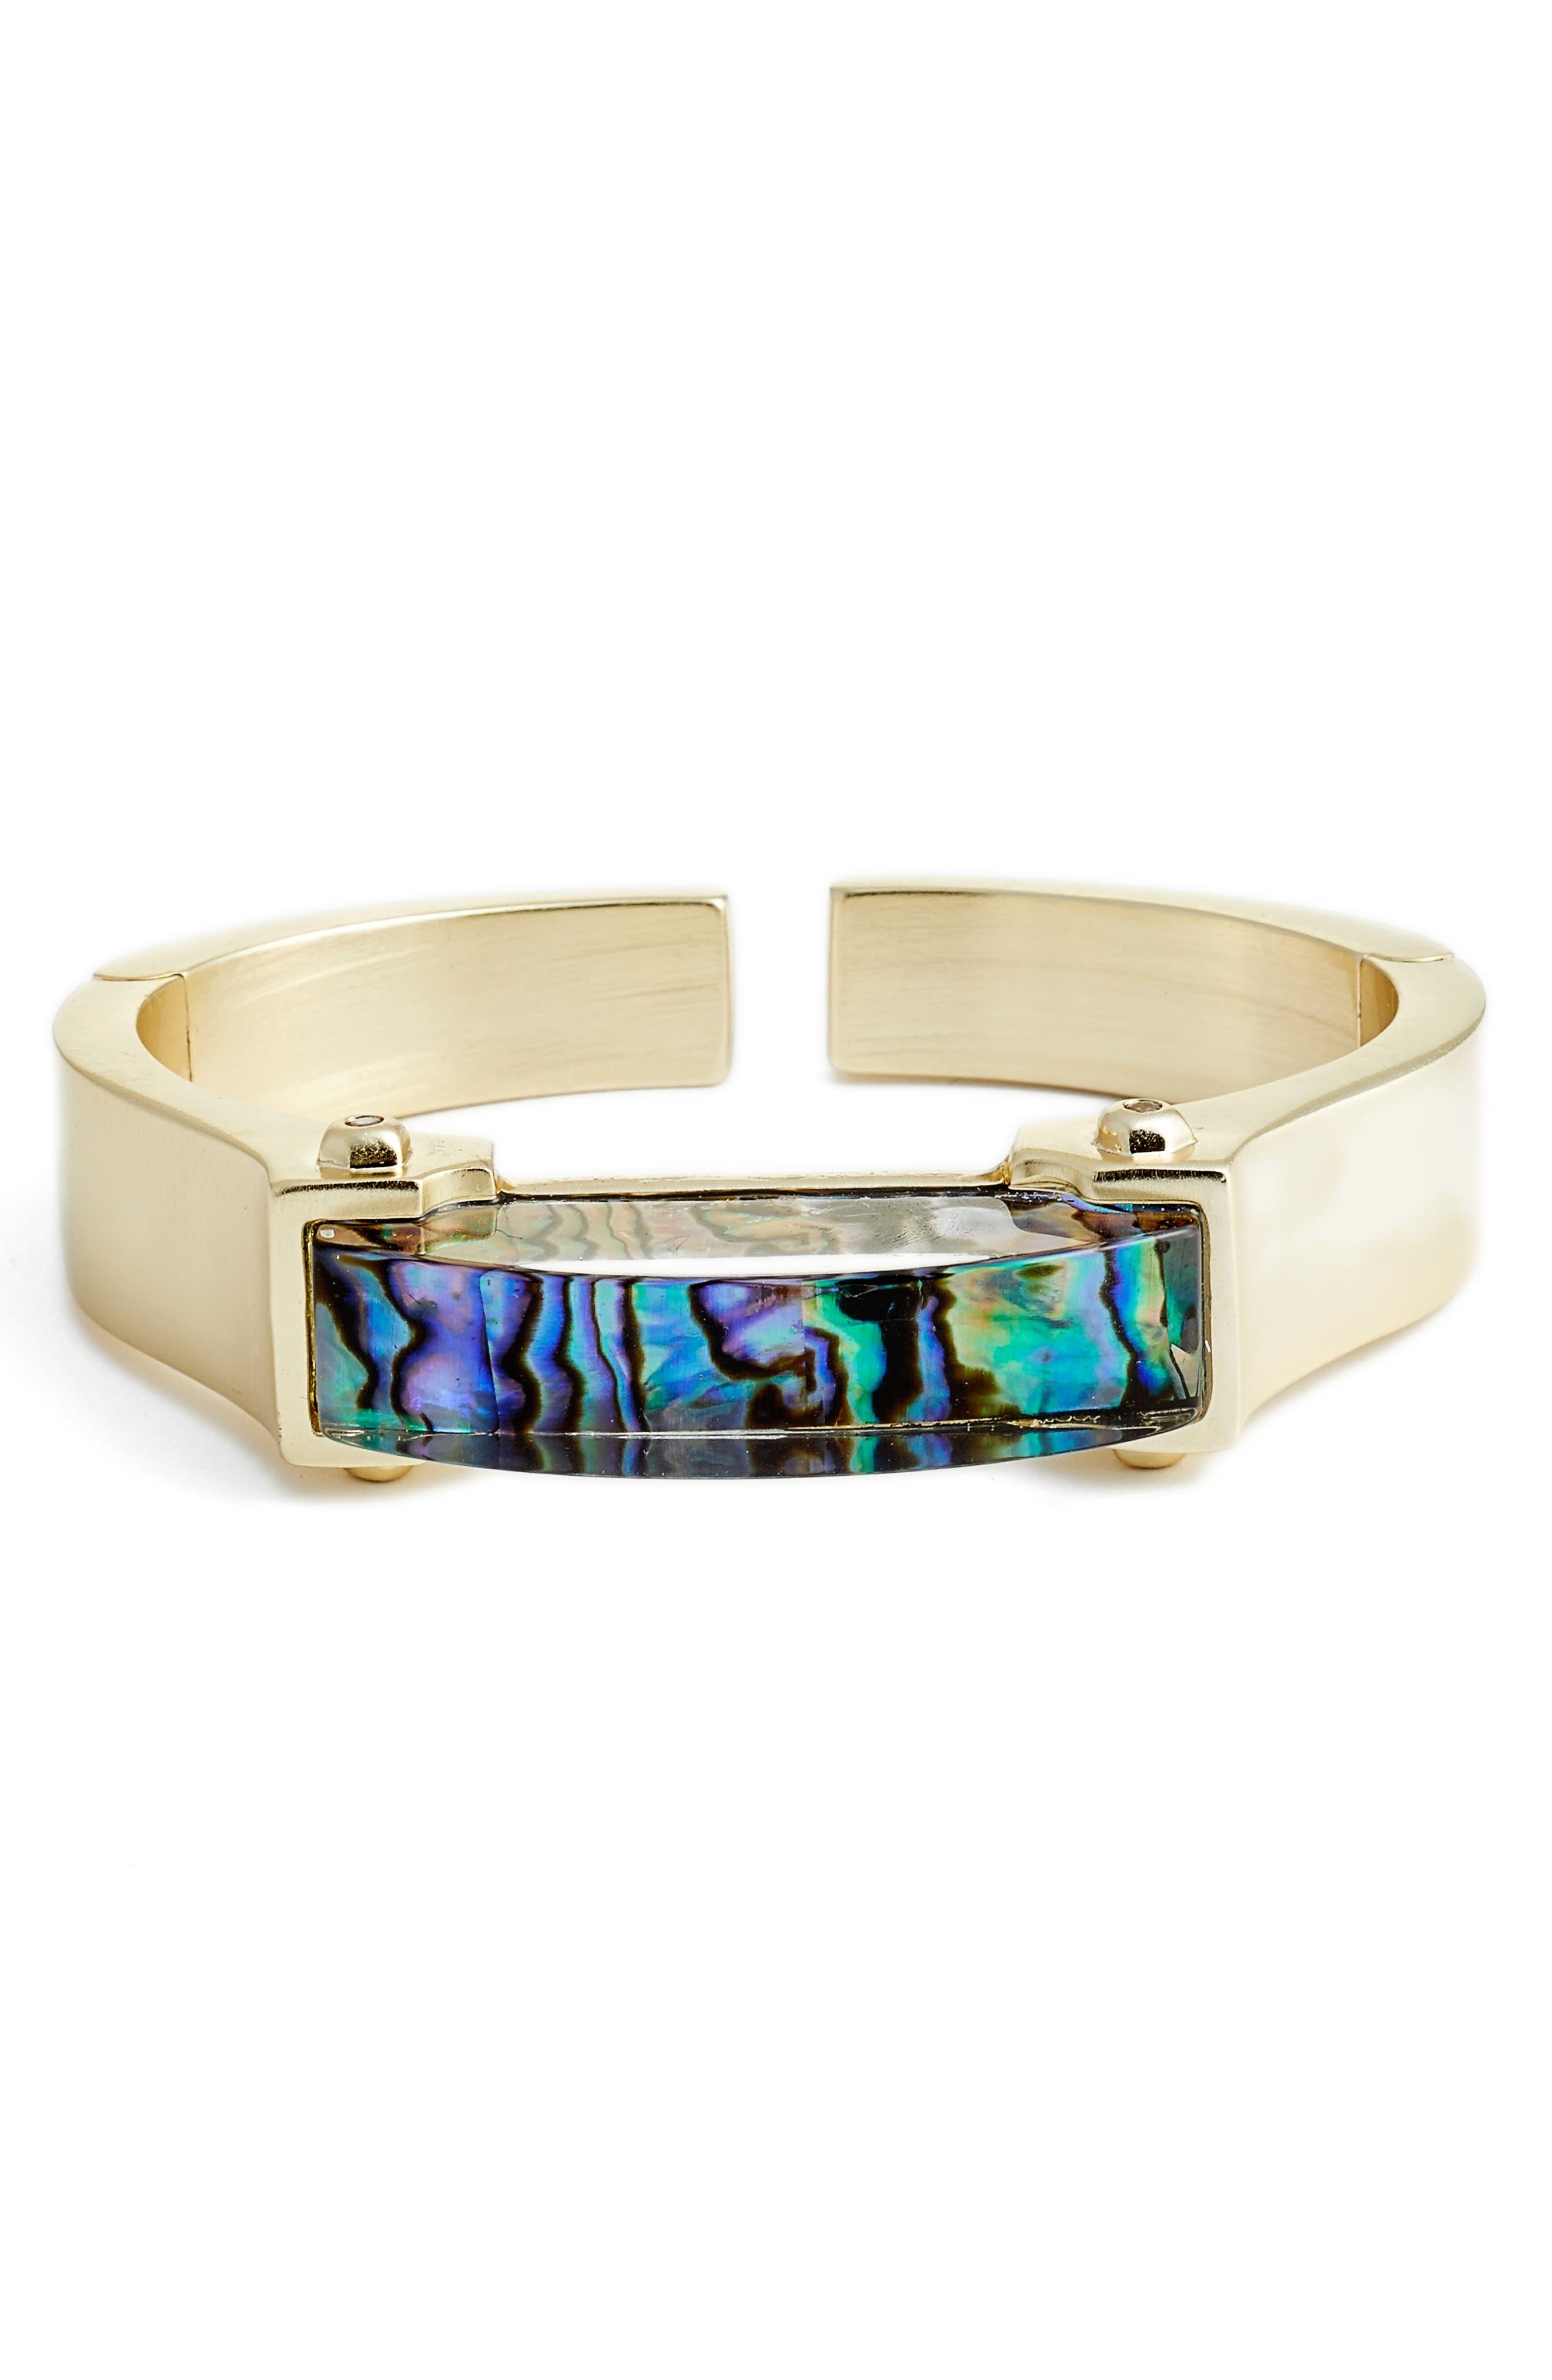 Kendra Scott Kailey Cuff Bracelet